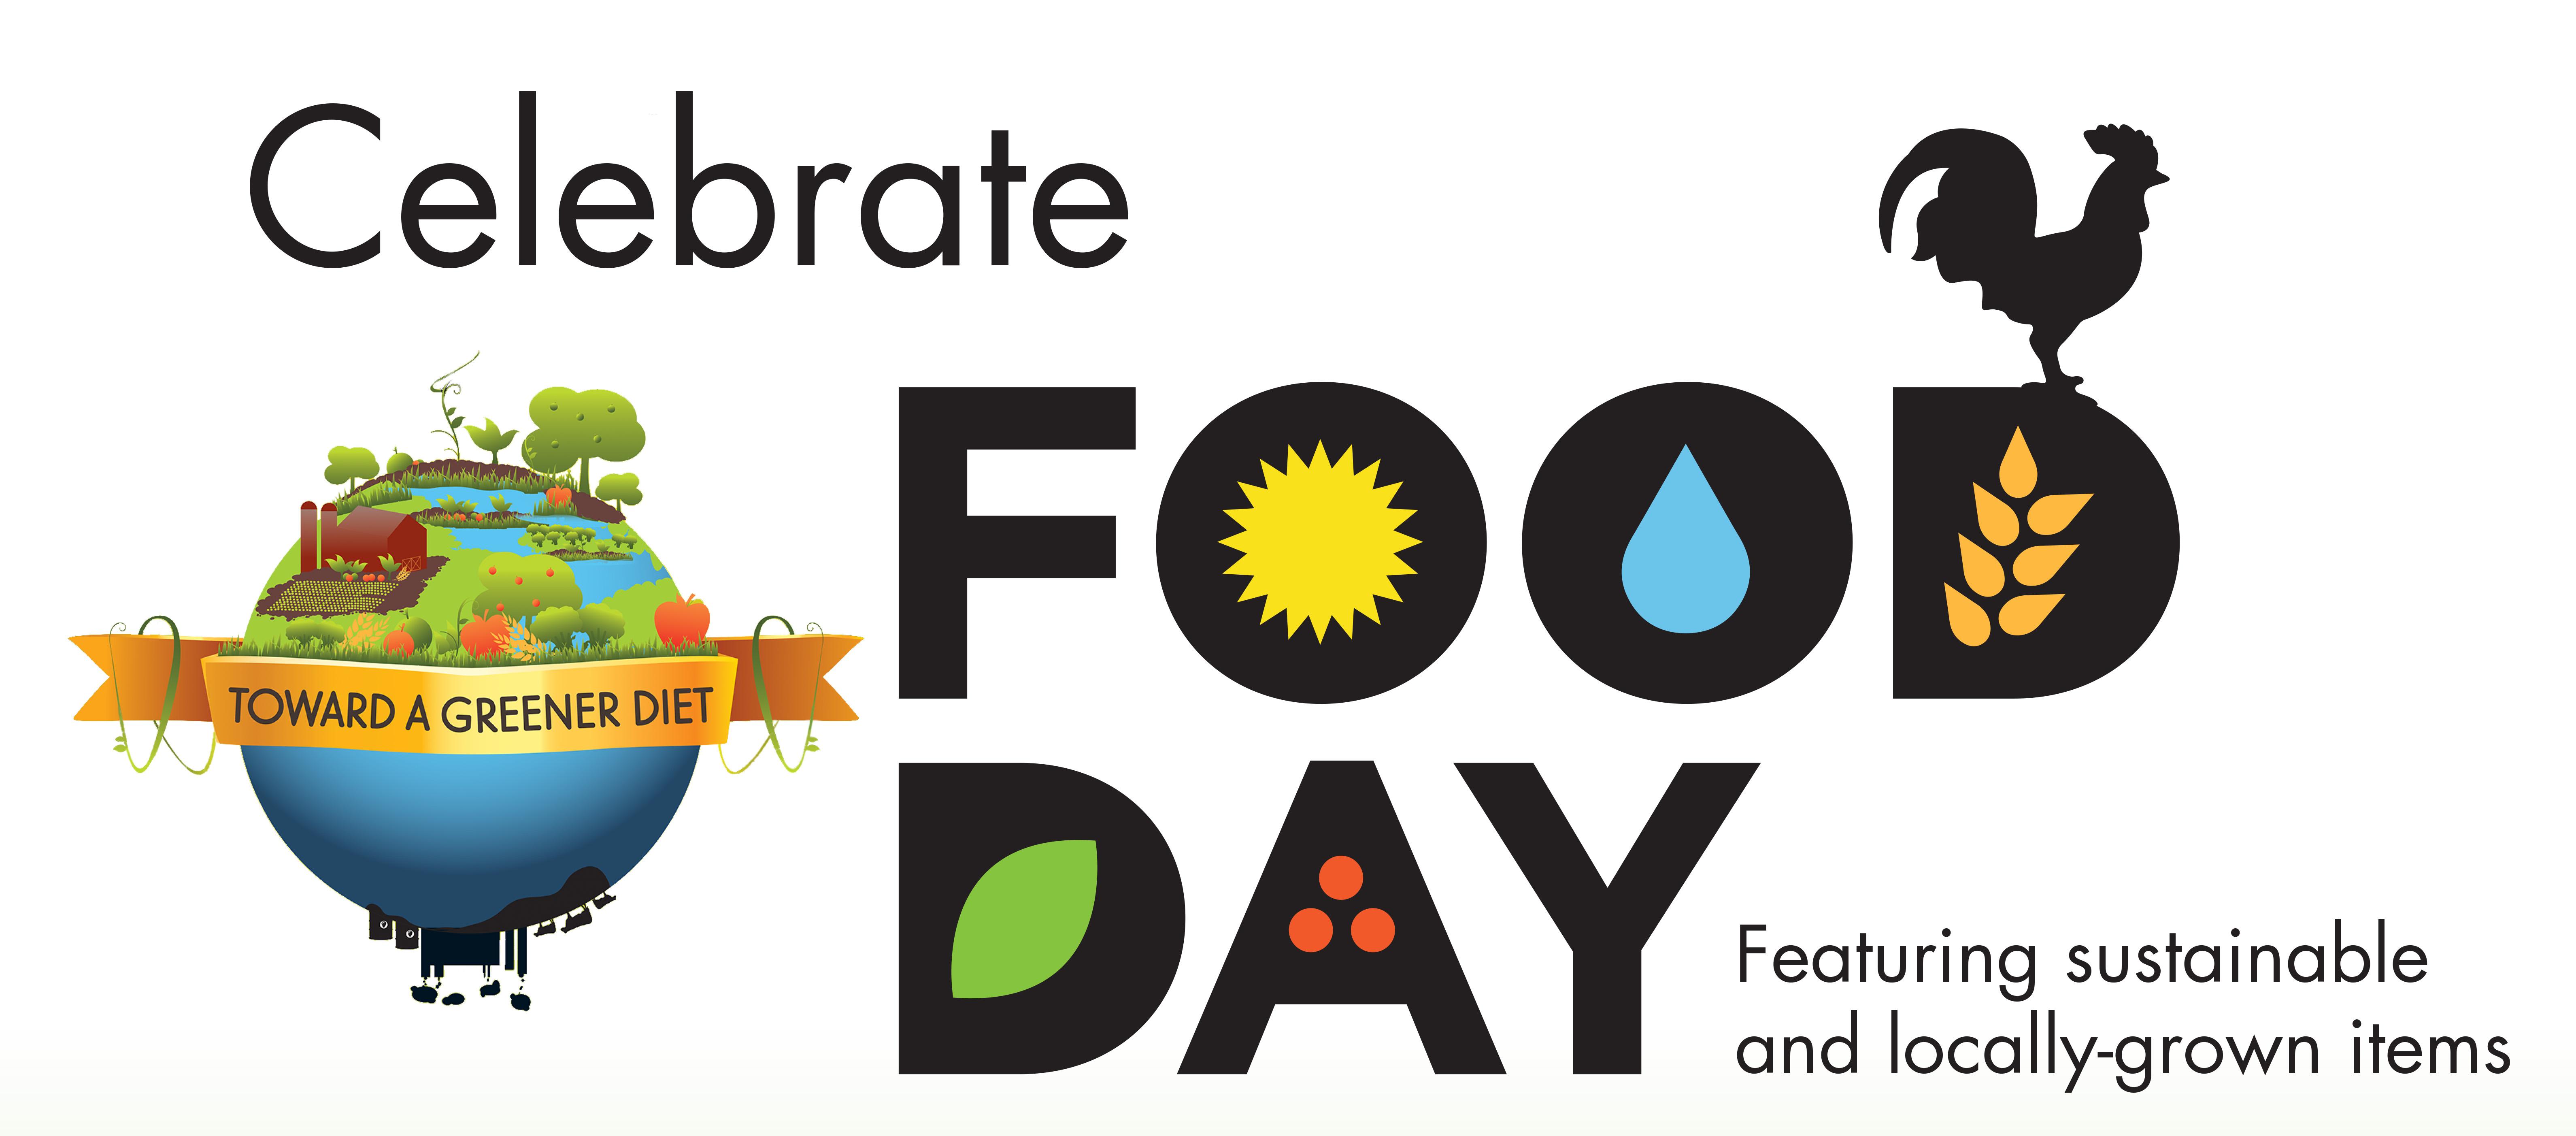 Celebrate clipart food. Ucla health sustainability events